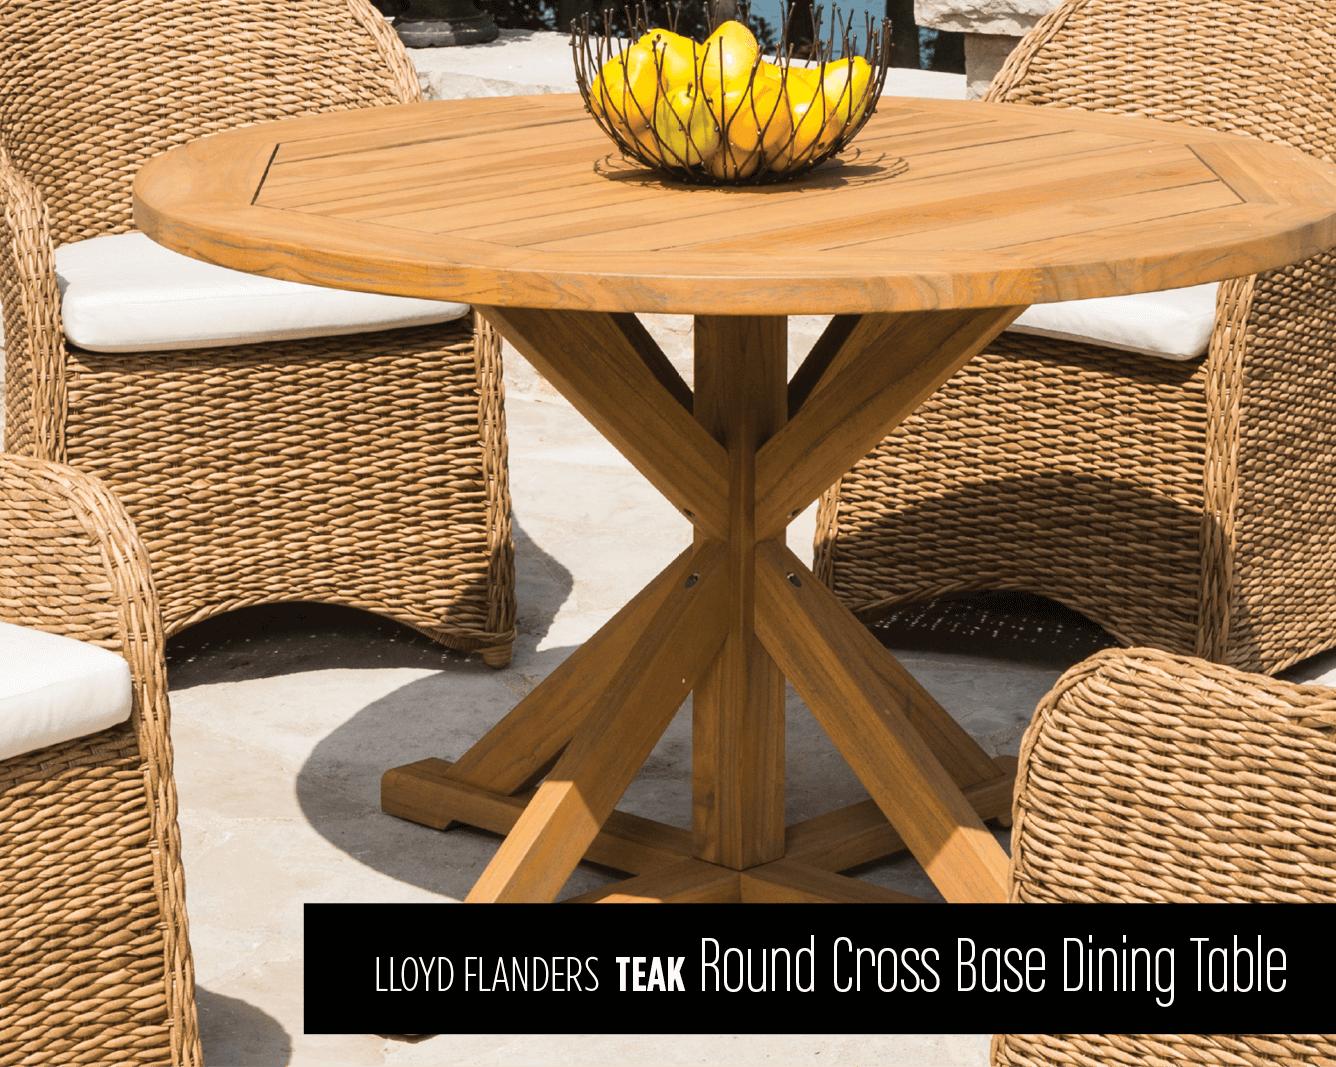 Lloyd Flanders Teak Round Cross Base Dining Table